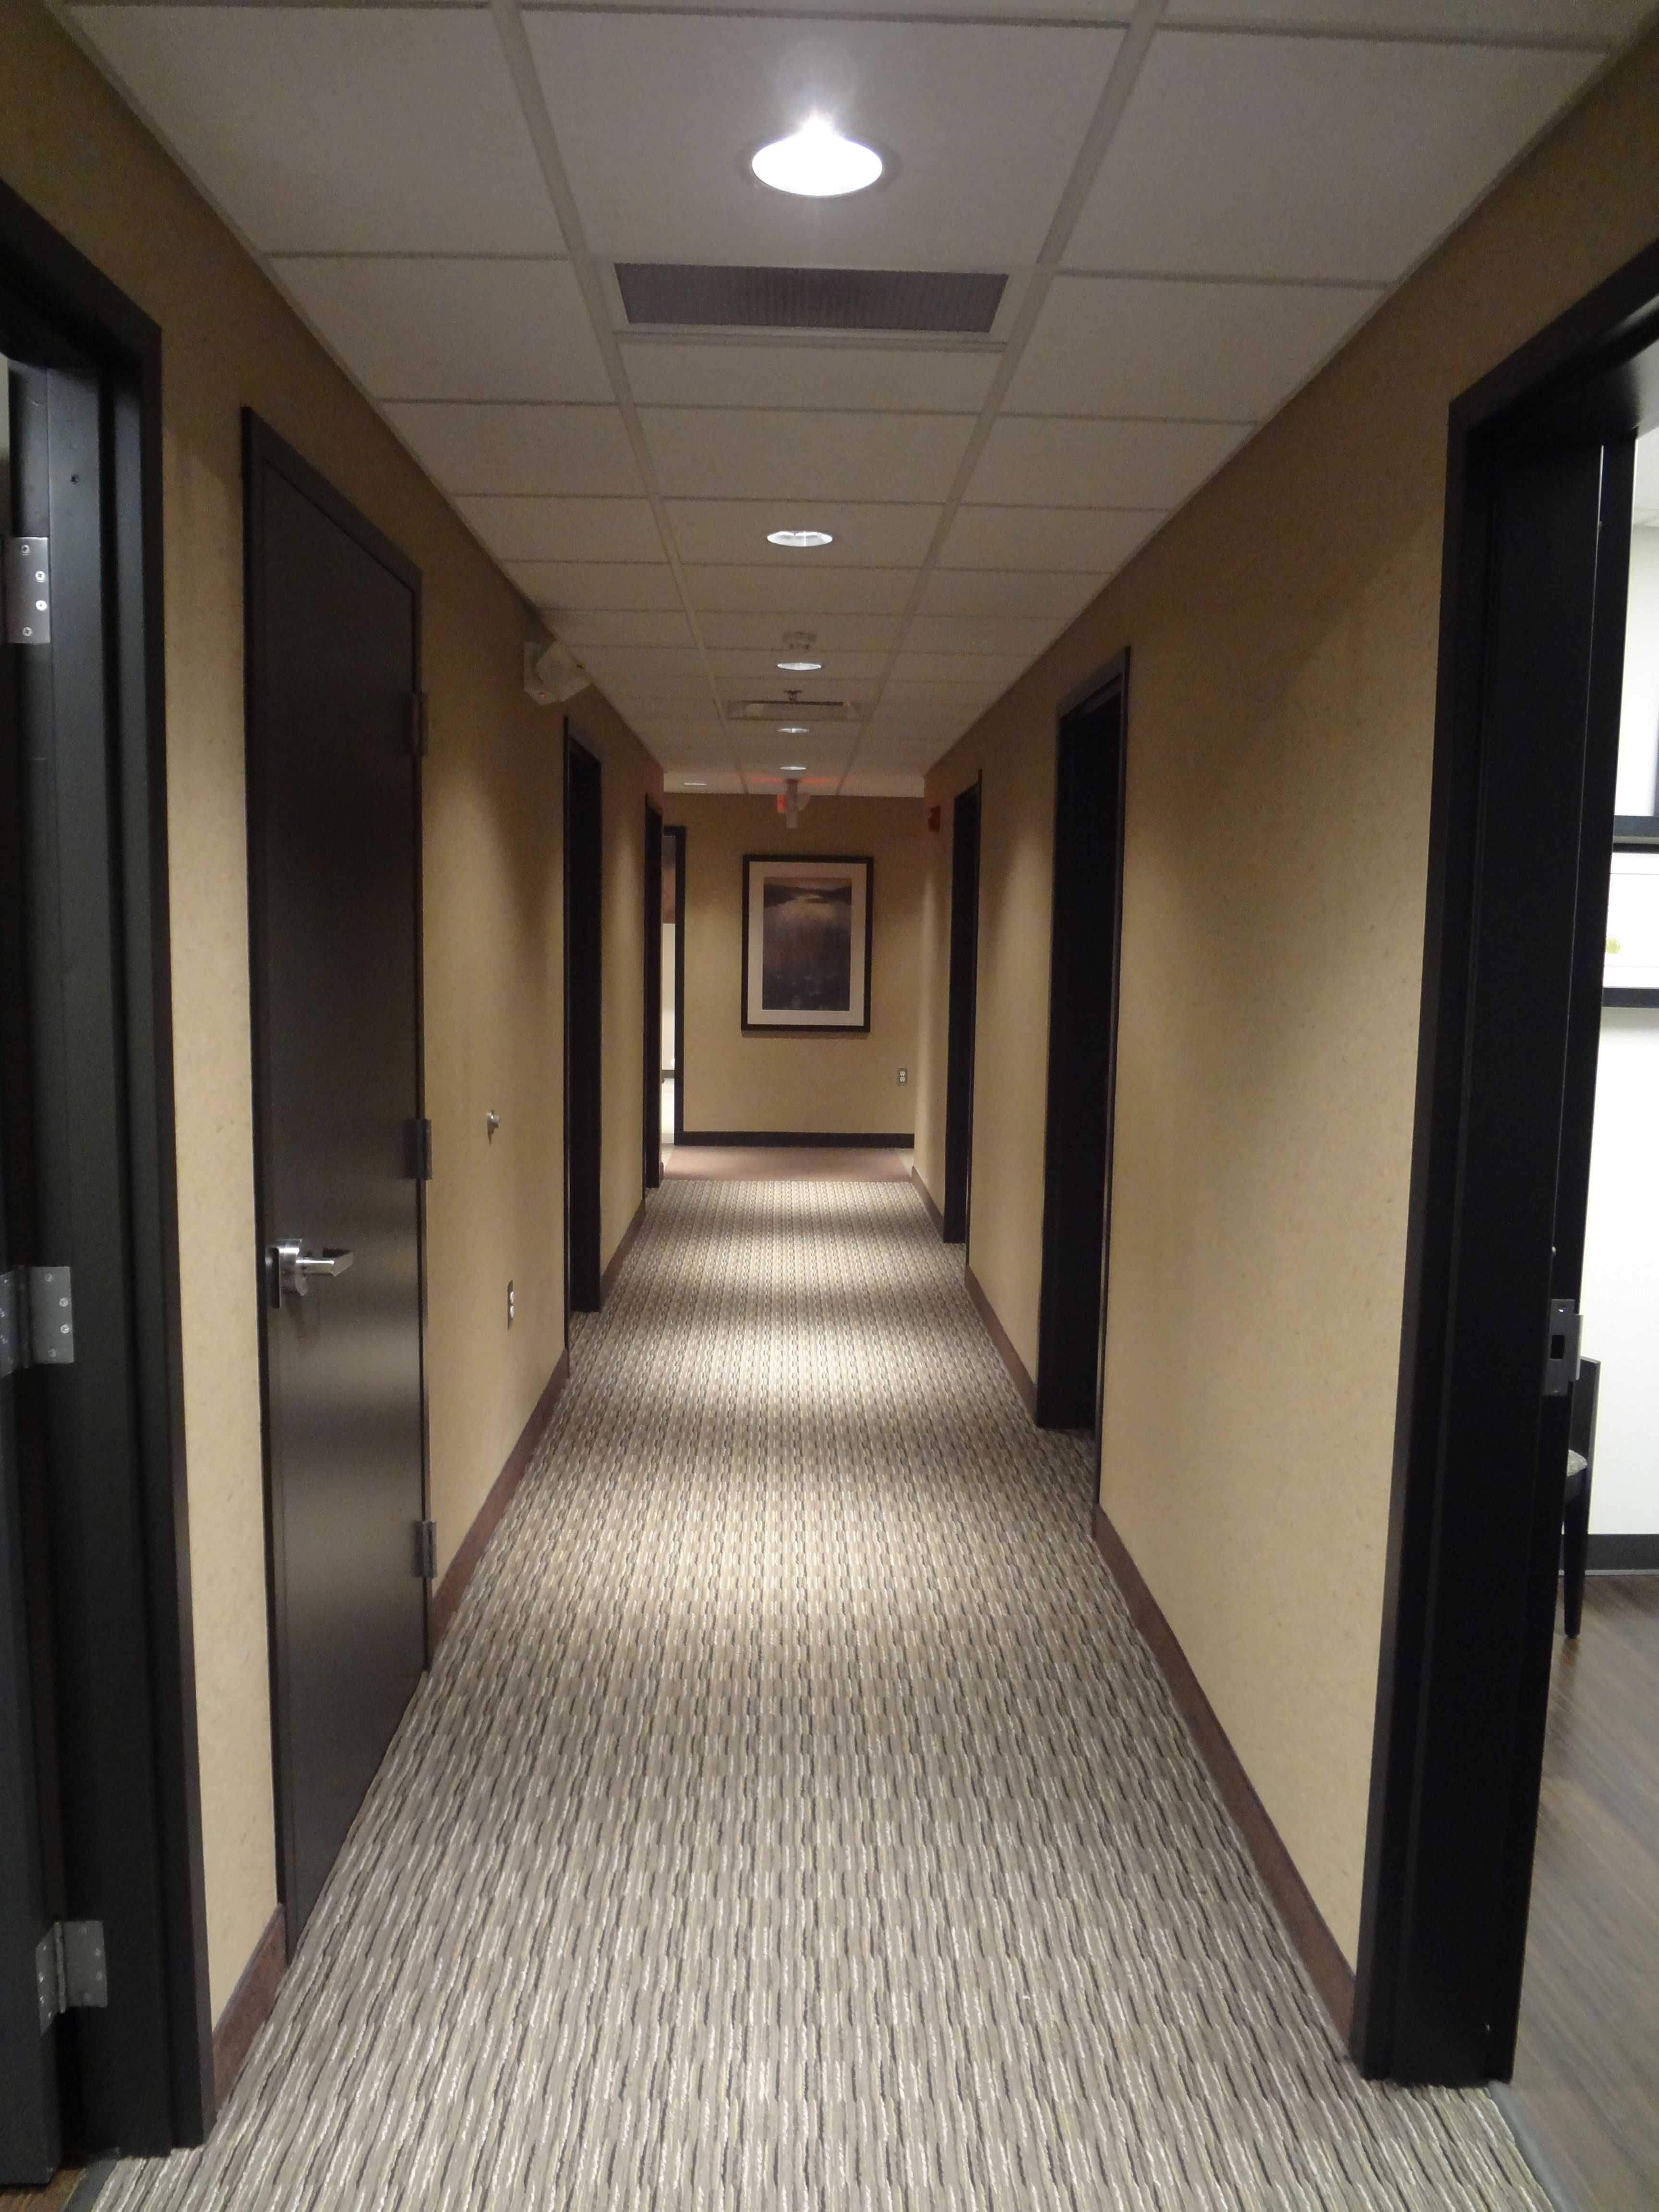 Hallway of medical office with carpet custom stained oak doors hallway of medical office with carpet custom stained oak doors and recessed can lighting baanklon Gallery